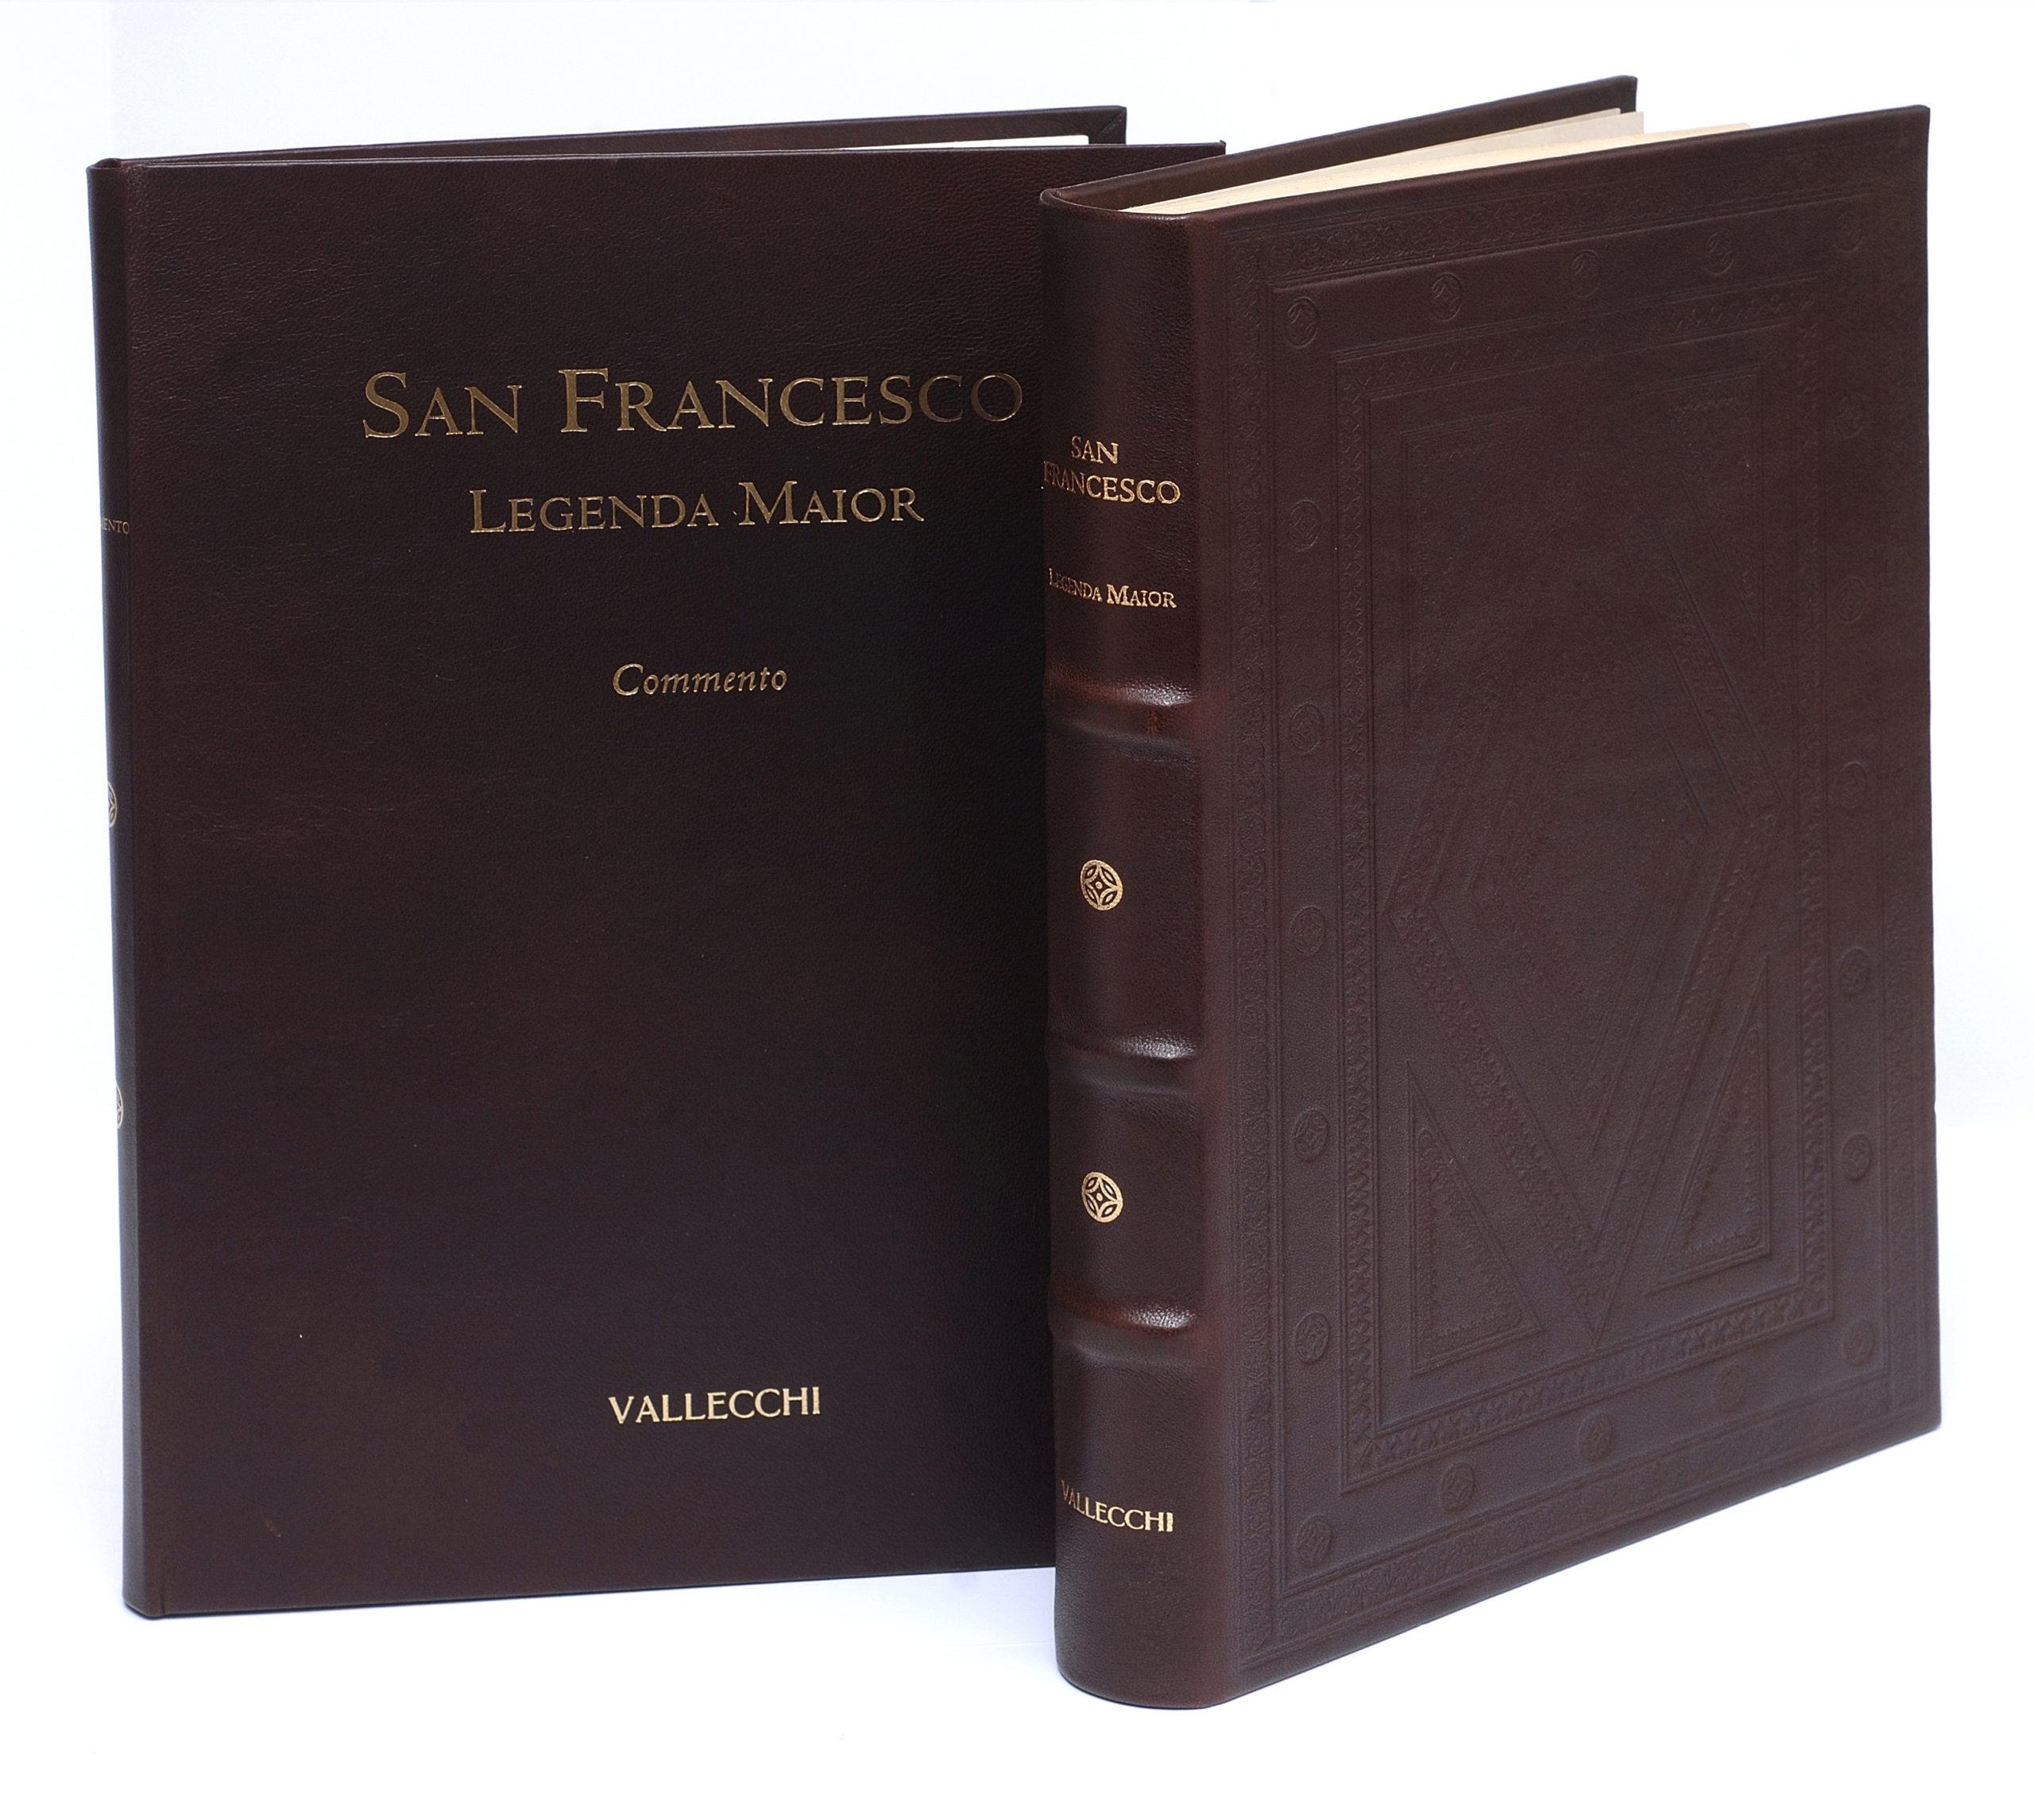 San Francesco - Legenda Maior